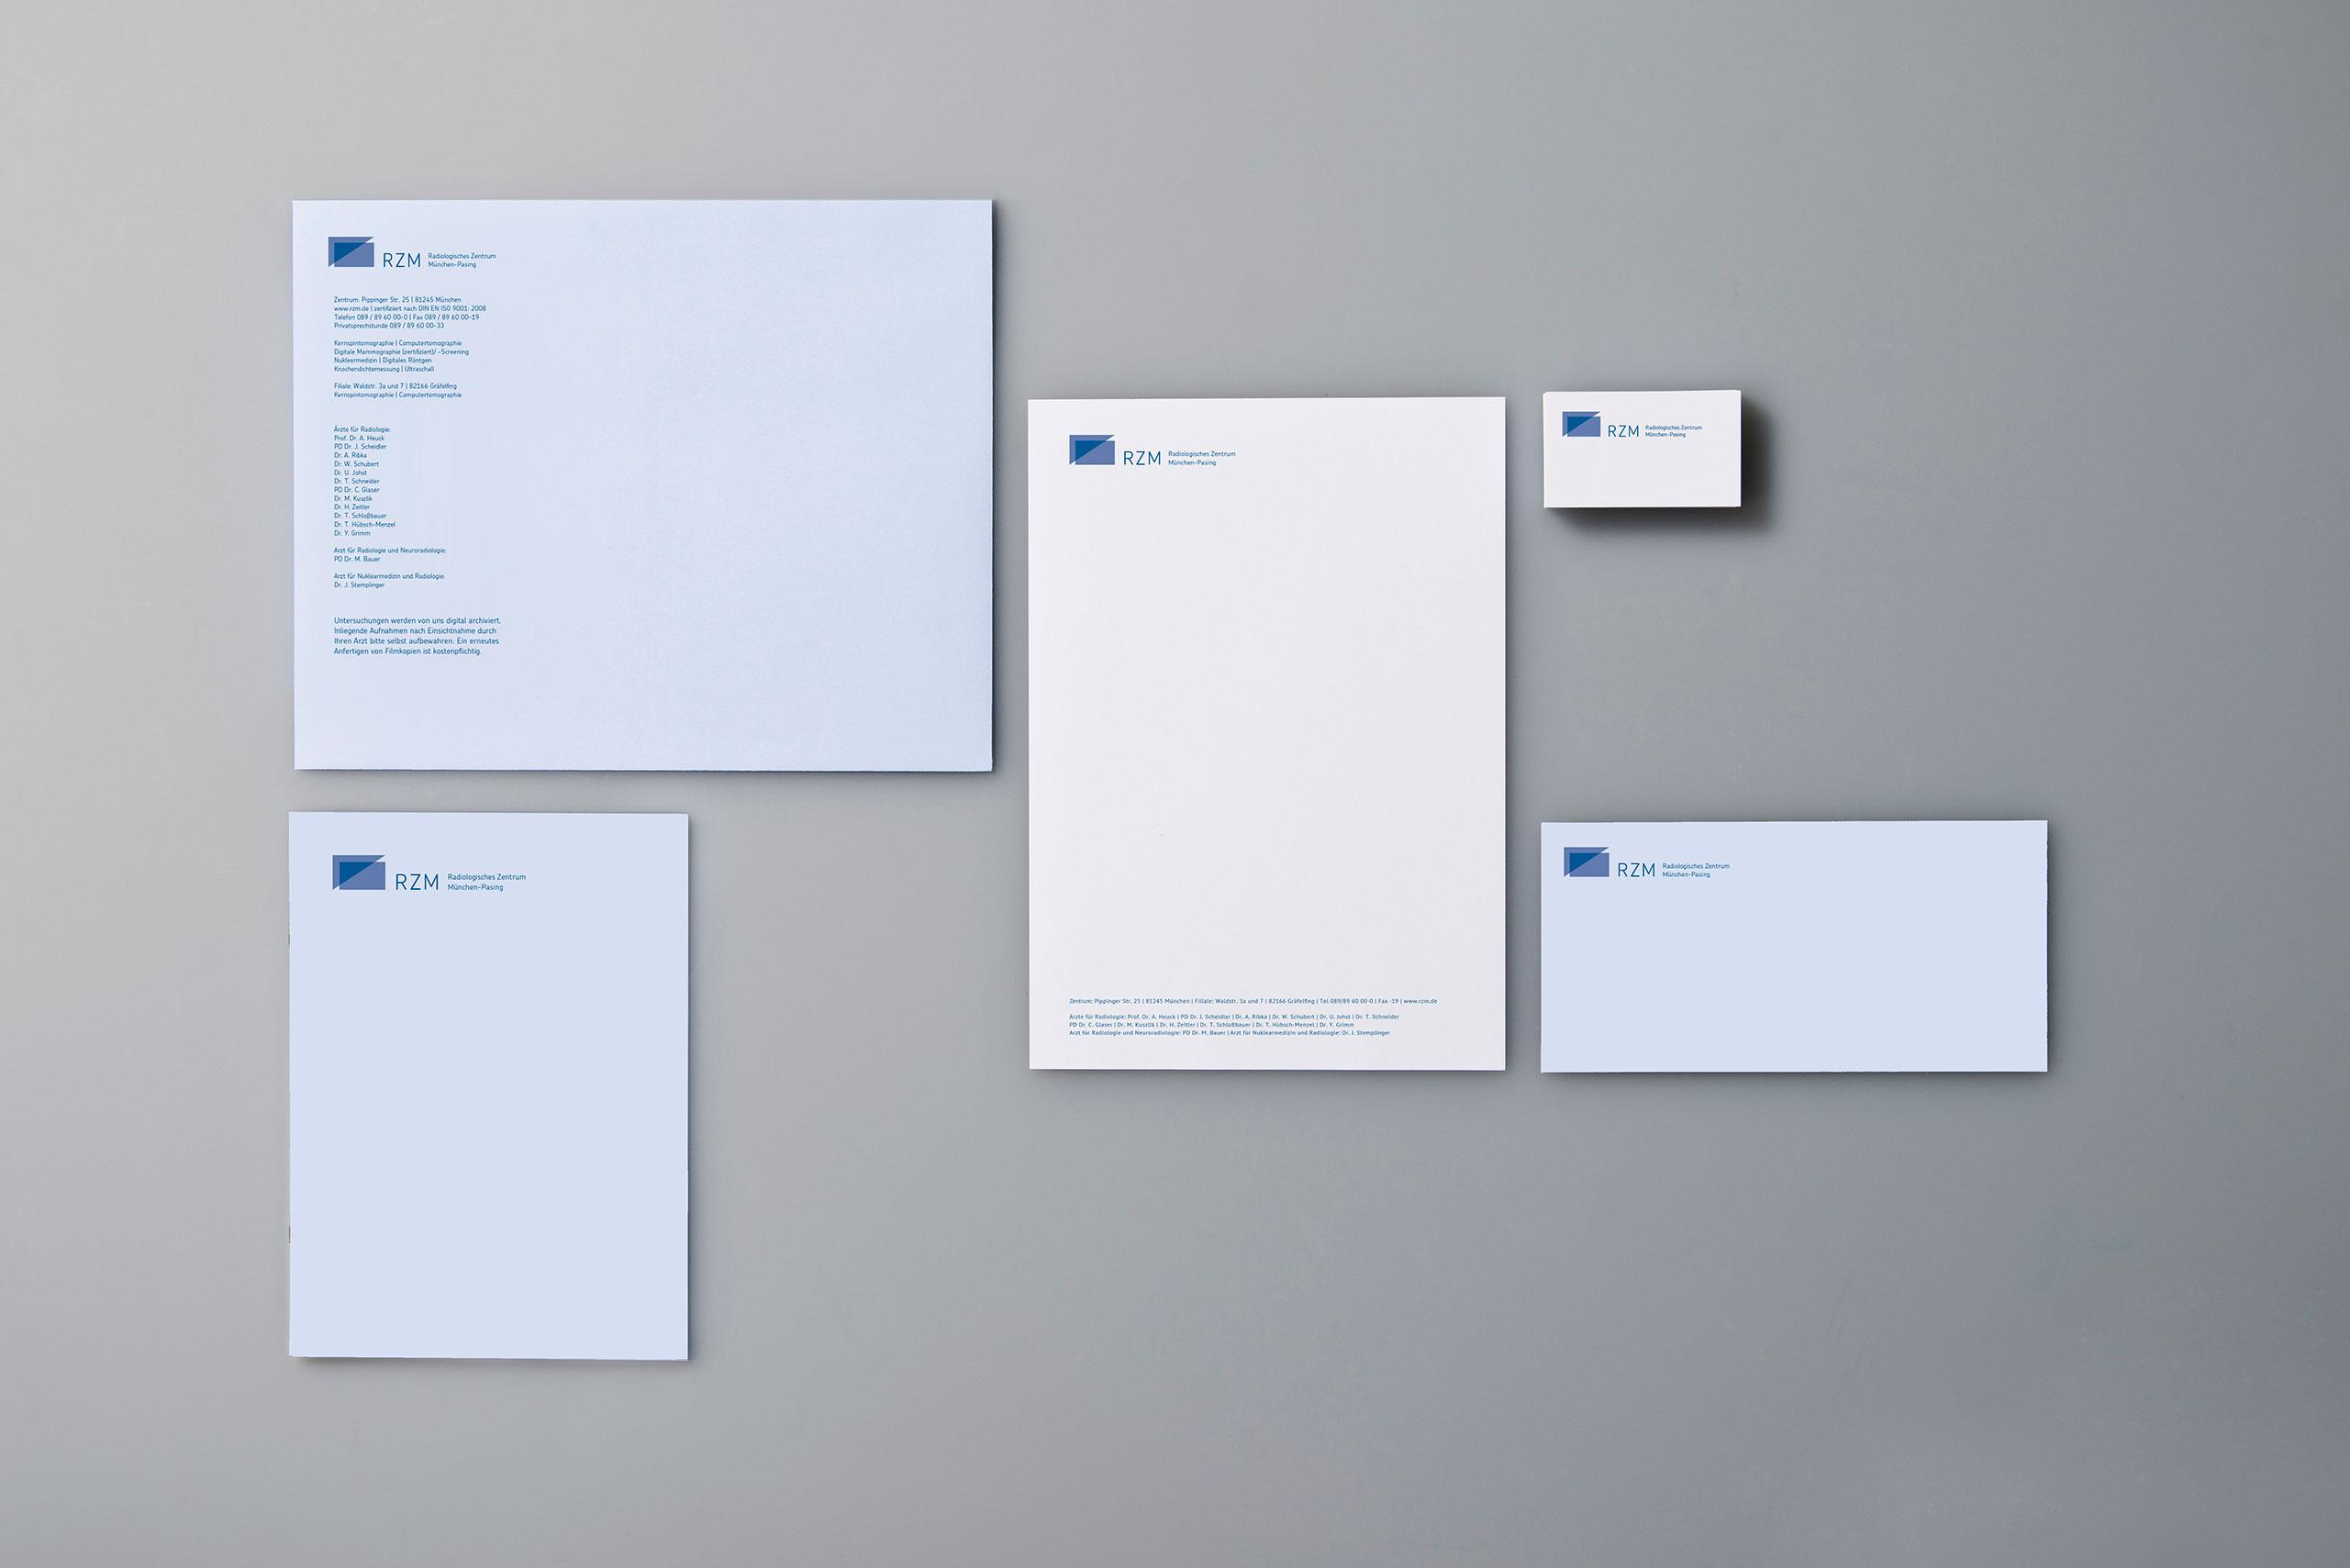 Radiologisches Zentrum München Pasing, Arzt, Corporate Design, Briefbogen, Visitenkarte